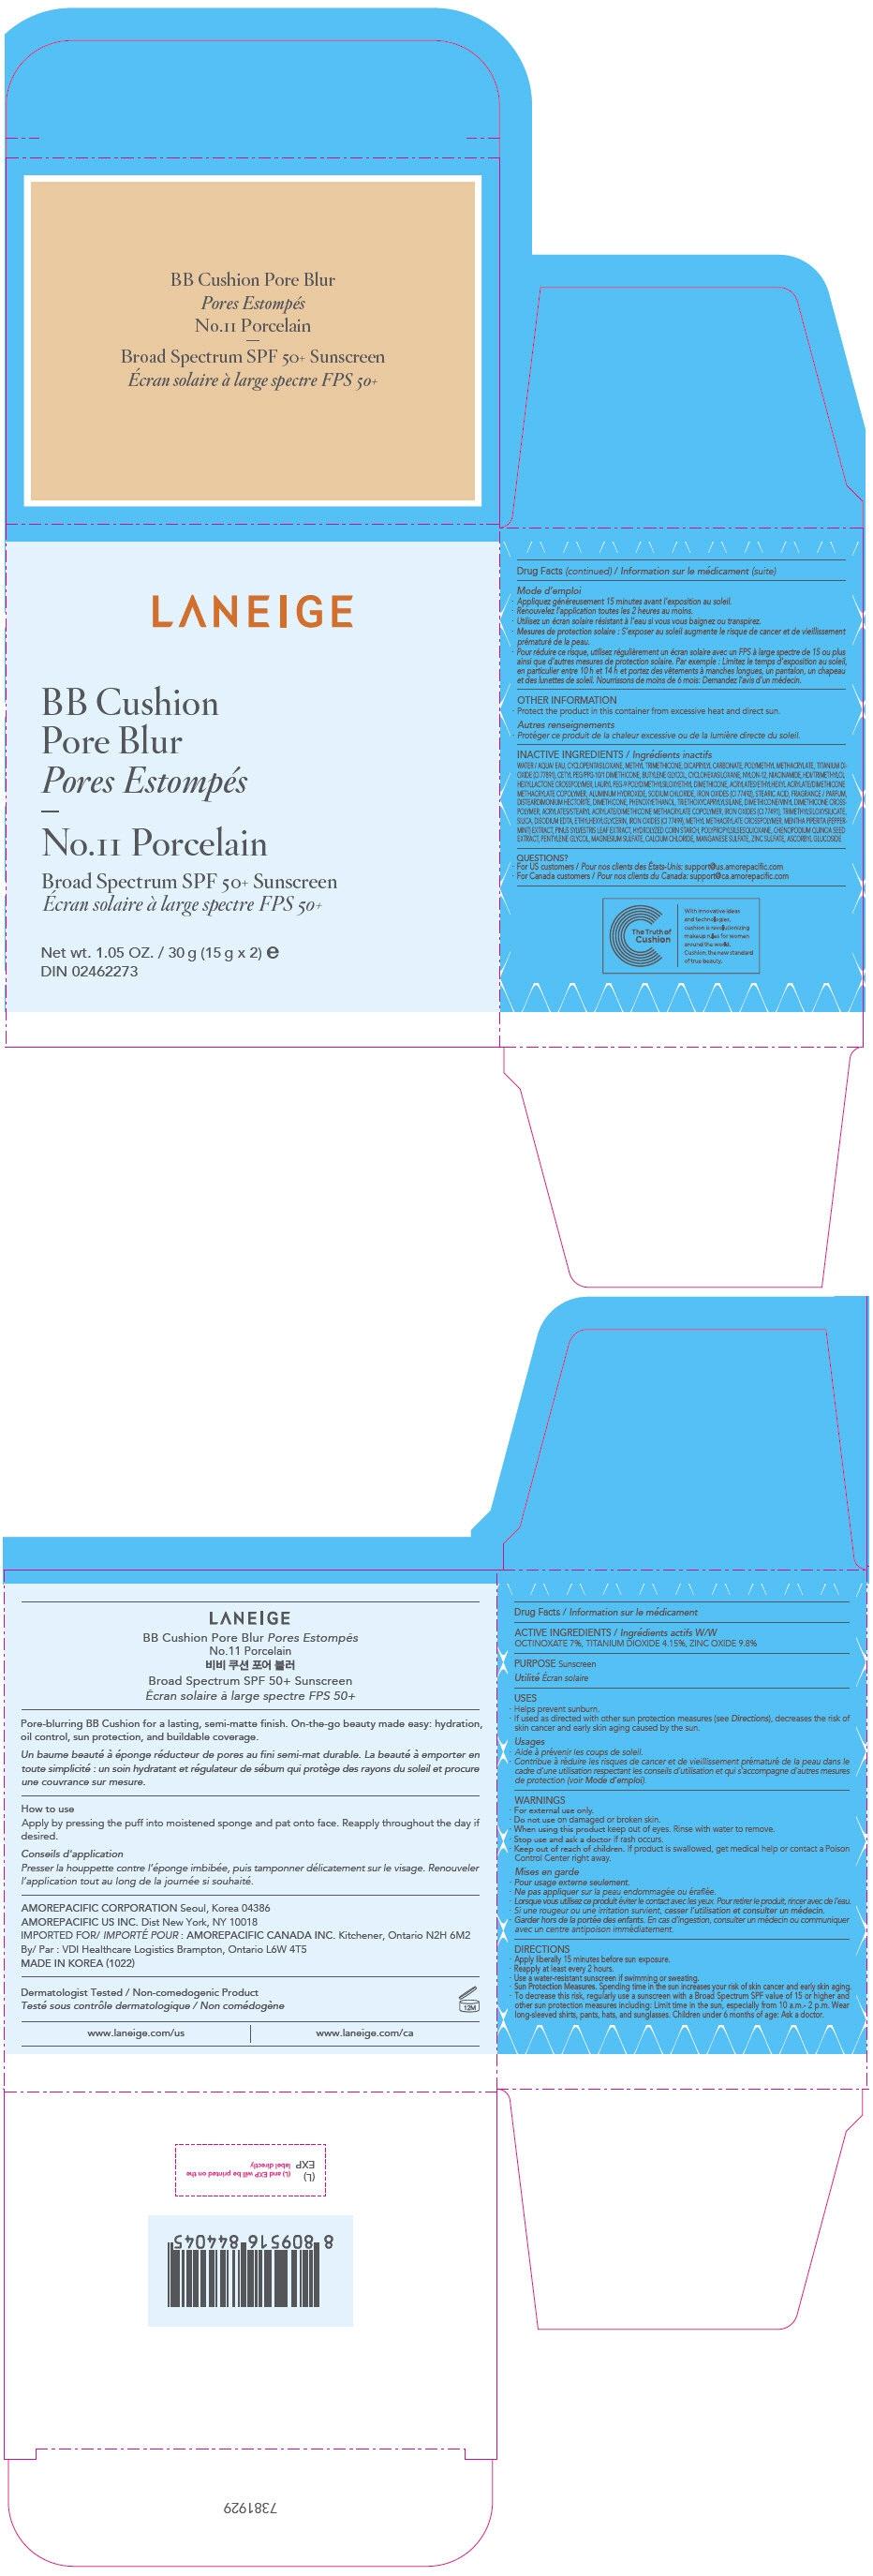 PRINCIPAL DISPLAY PANEL - 30 g Container Carton - No.11 Porcelain